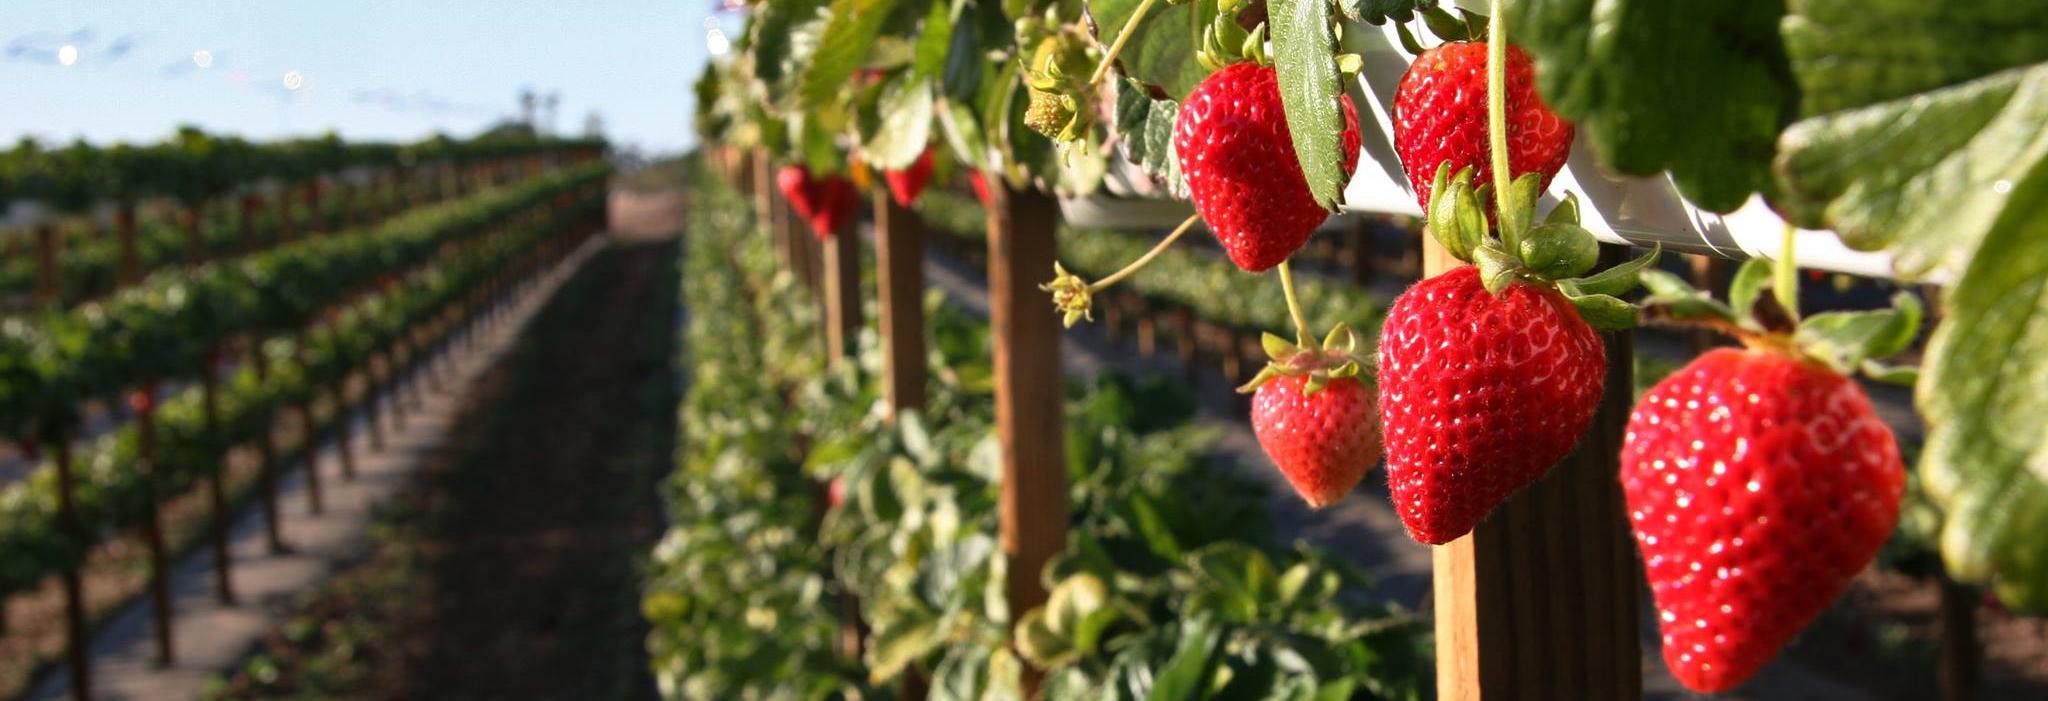 tanaka farms irvine ca fresh strawberries orange county ca